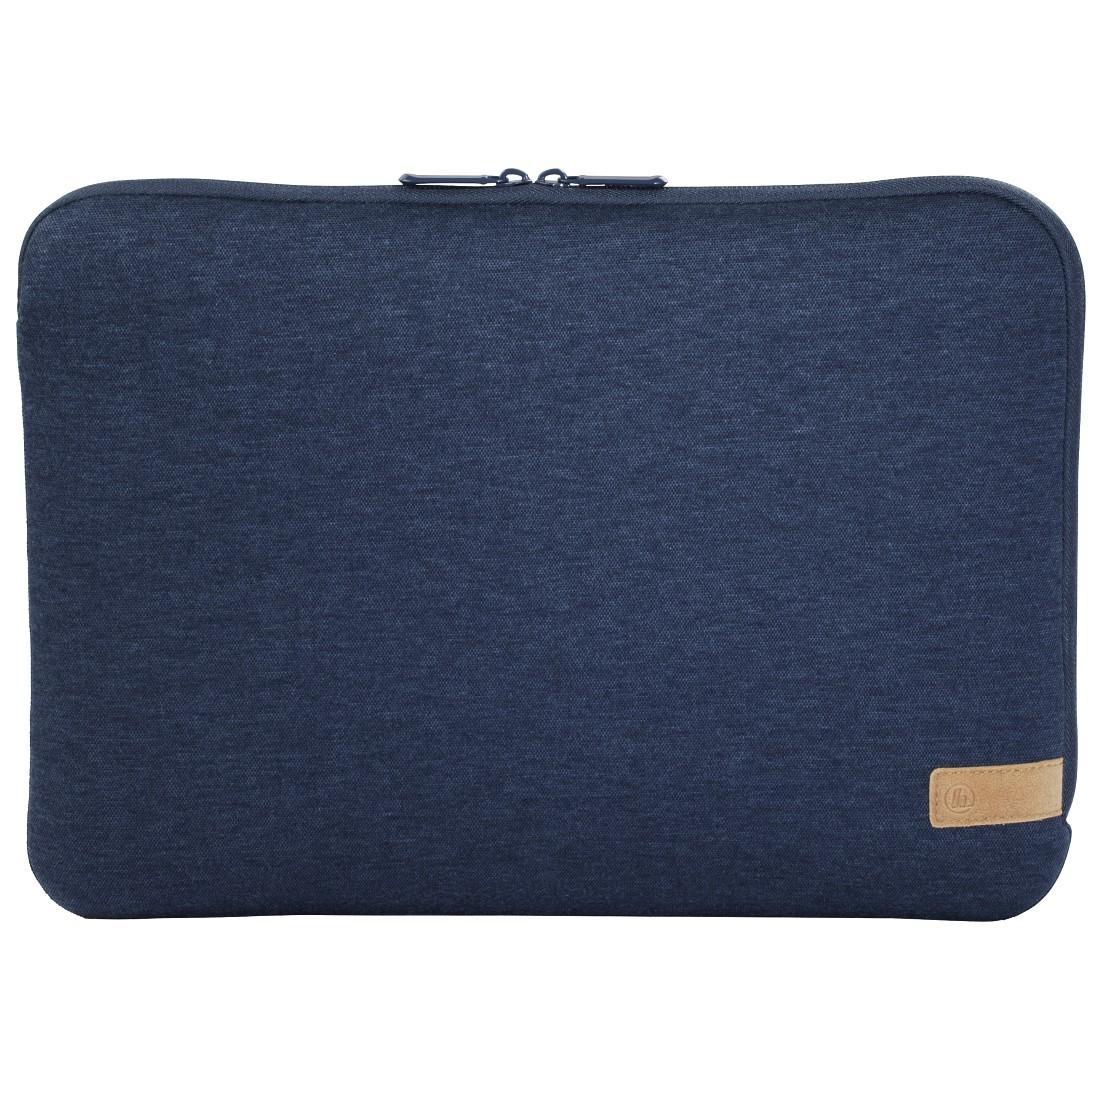 Универсален калъф за лаптоп HAMA Jersey, до 34 см  (13.3), Син